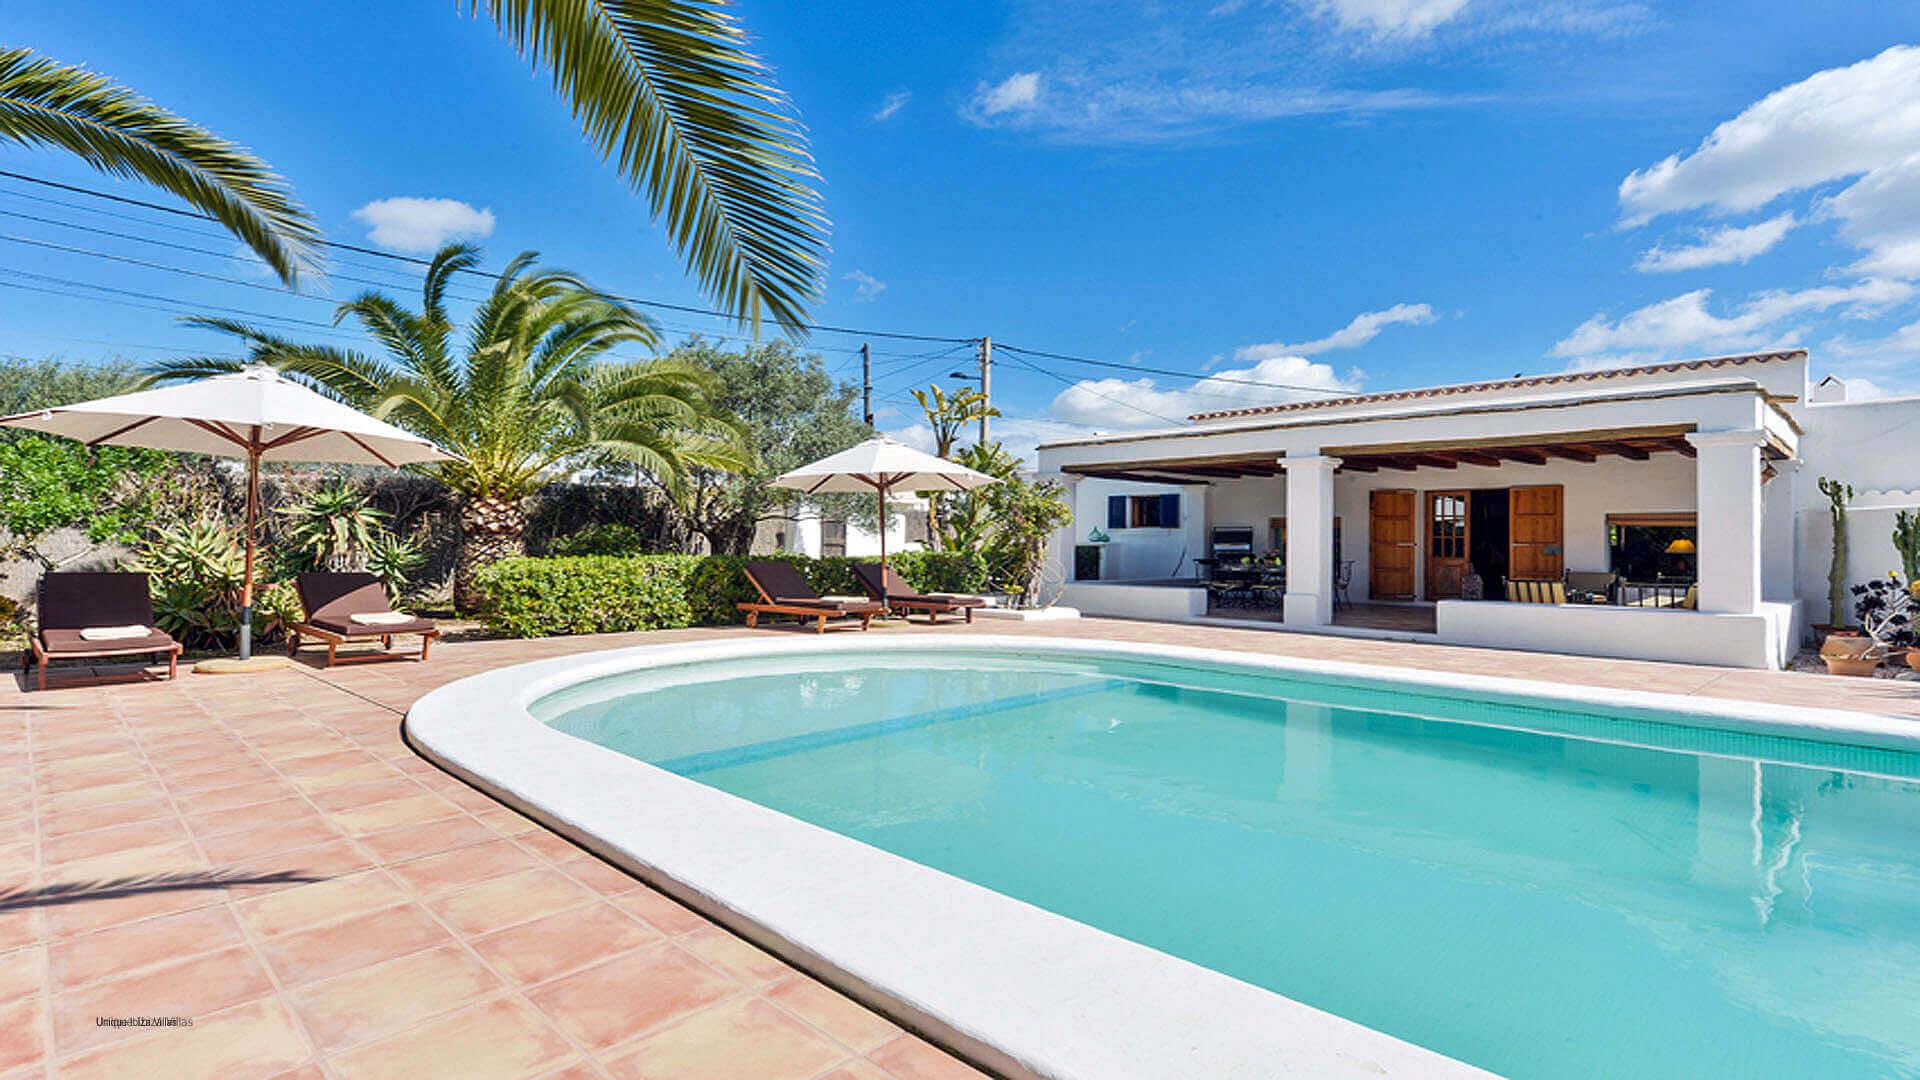 Villa Jaume Dalt Ibiza 2 Playa Den Bossa